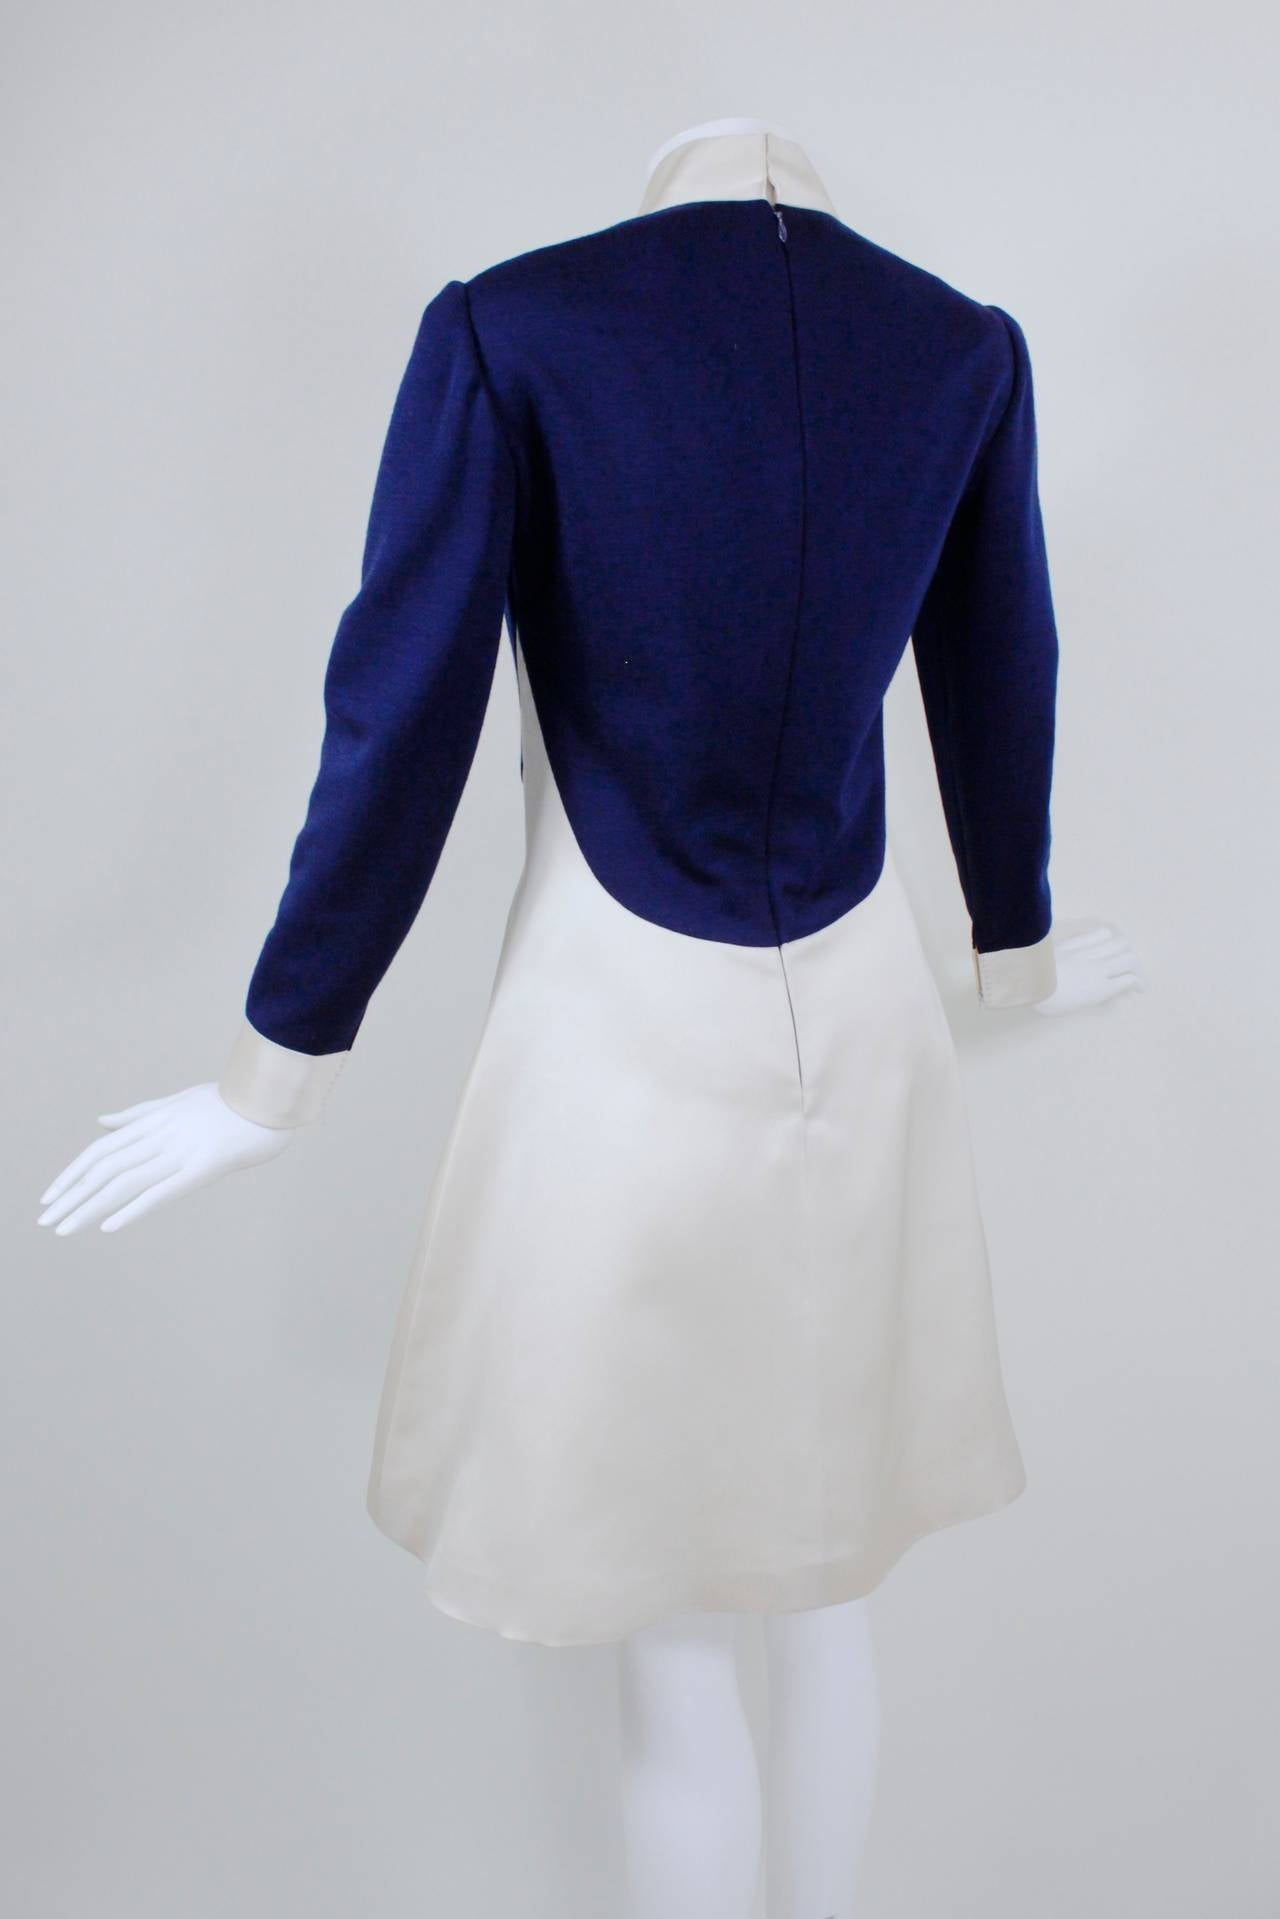 1960s Geoffrey Beene Navy Wool and Eggshell Mod Dress 7